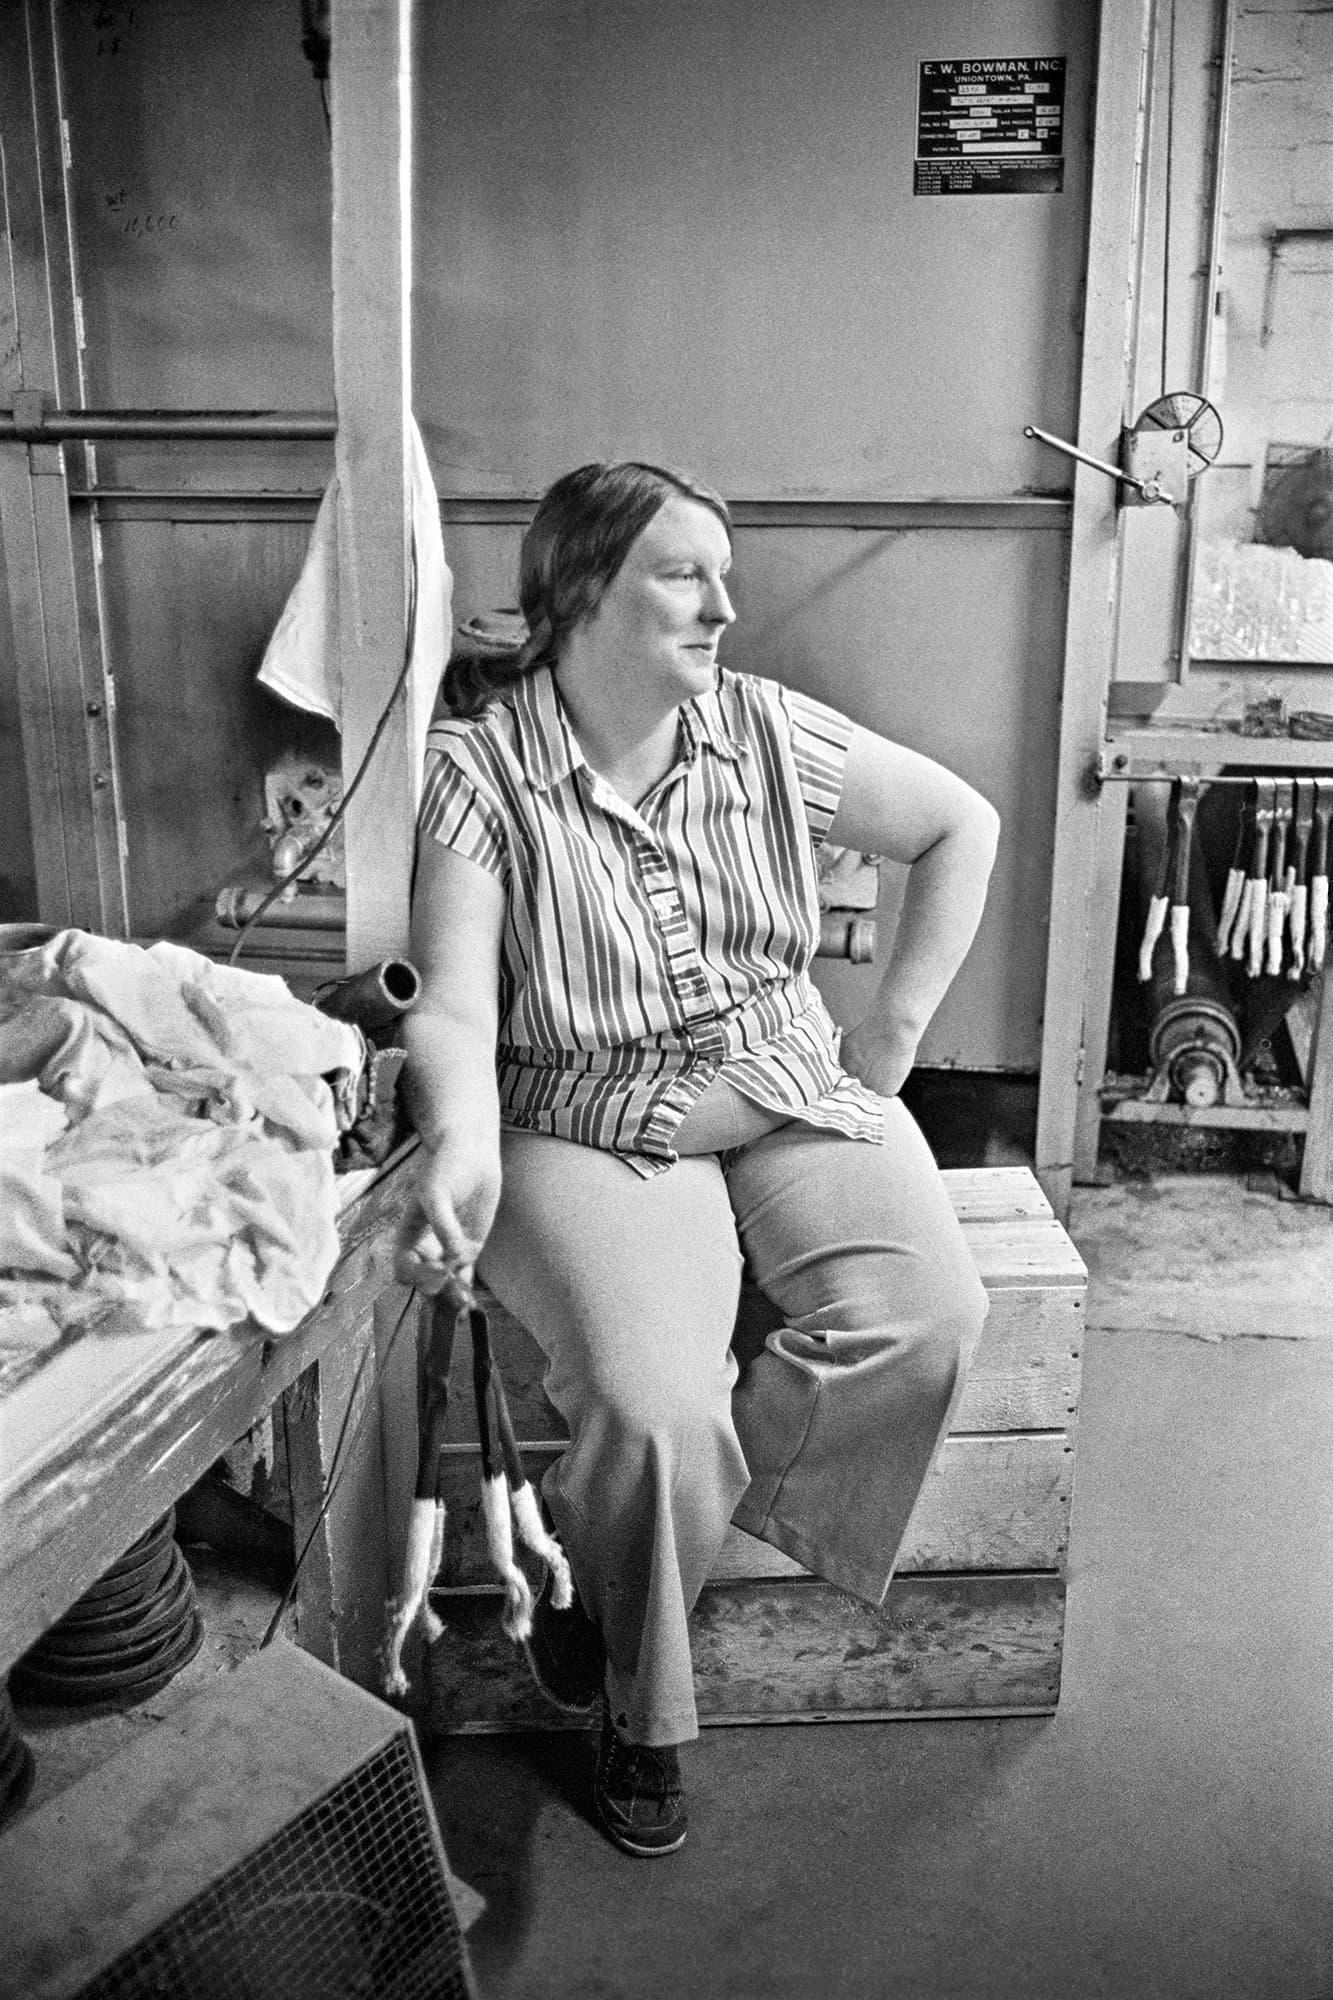 arthur-lazar-Factory-Worker-North-Carolina-1976